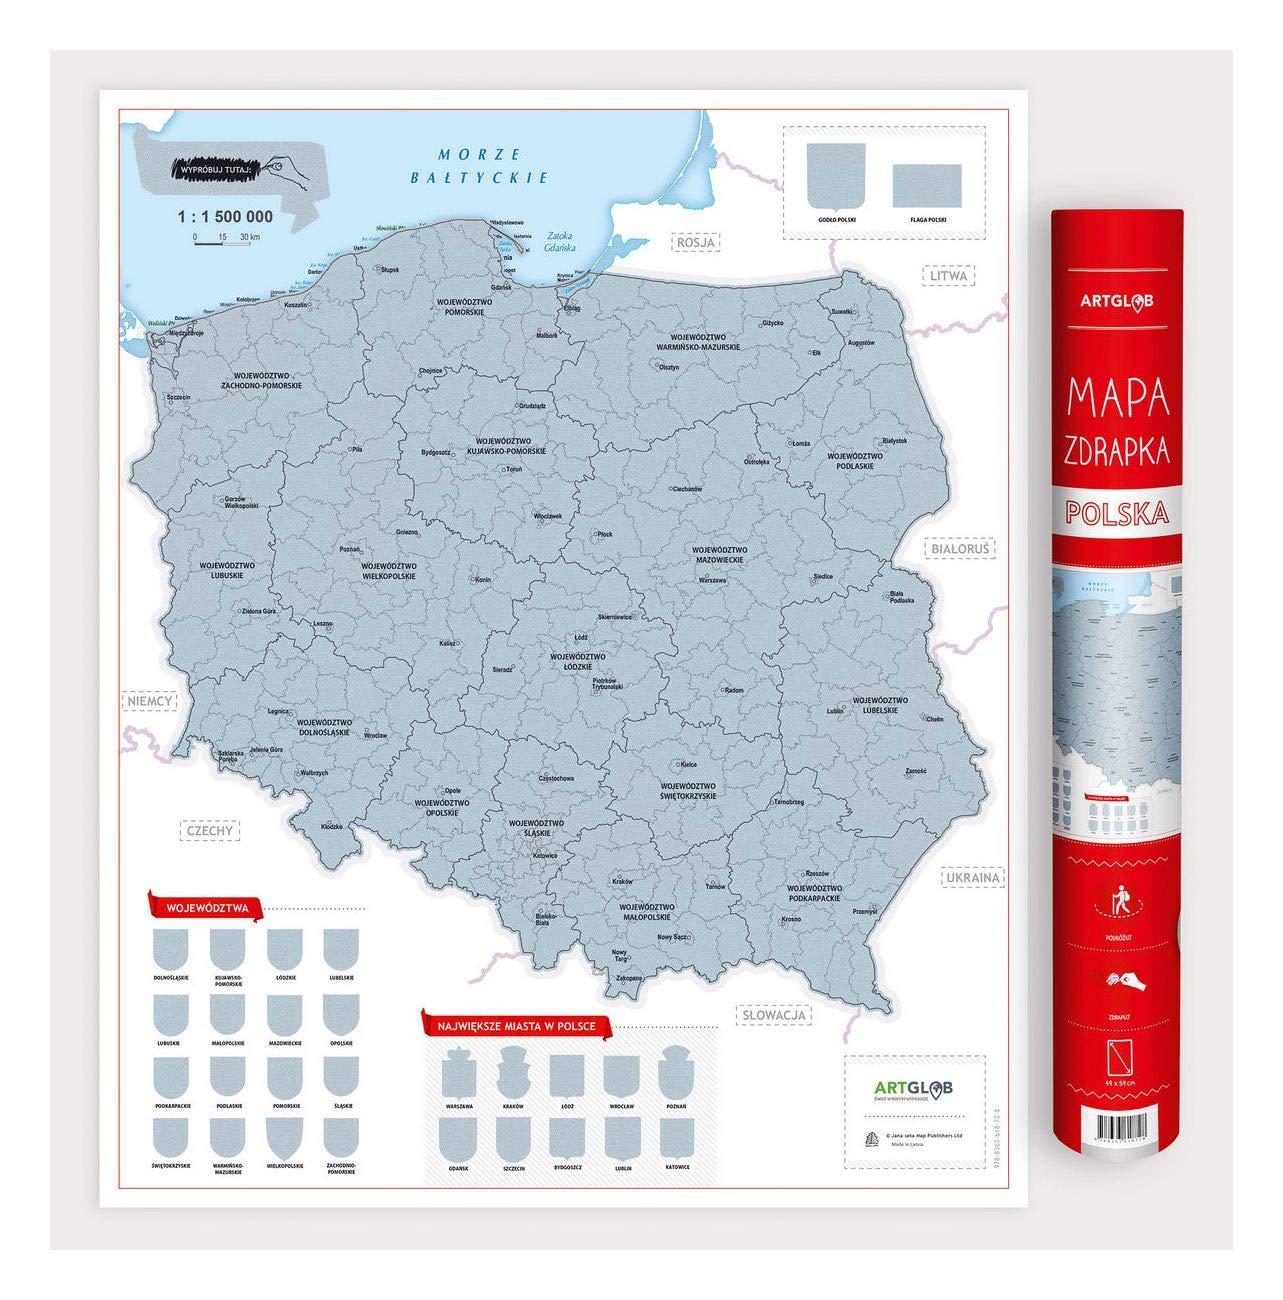 Mapa Zdrapka Polska Skala 1 1 500 000 9788363618728 Amazon Com